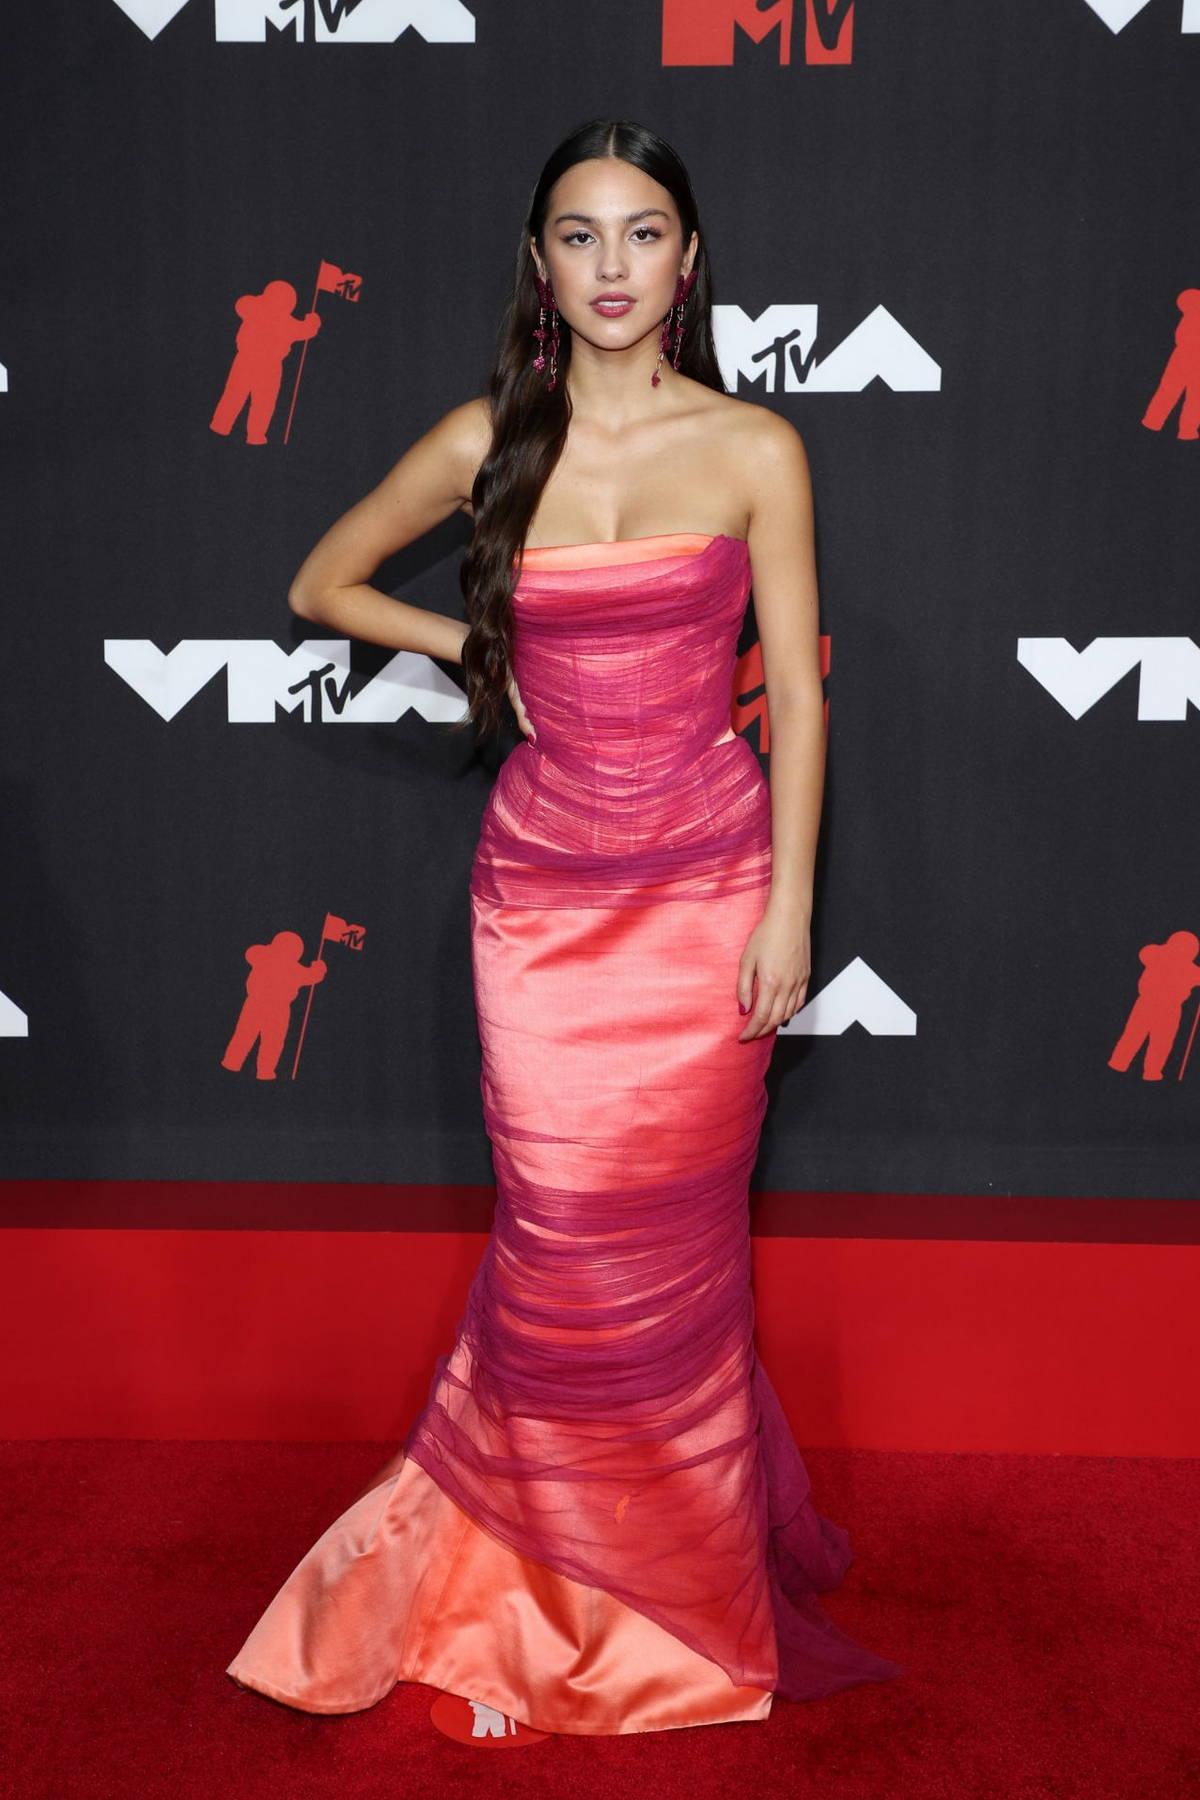 Olivia Rodrigo attends the 2021 MTV Video Music Awards at Barclays Center in Brooklyn, New York City